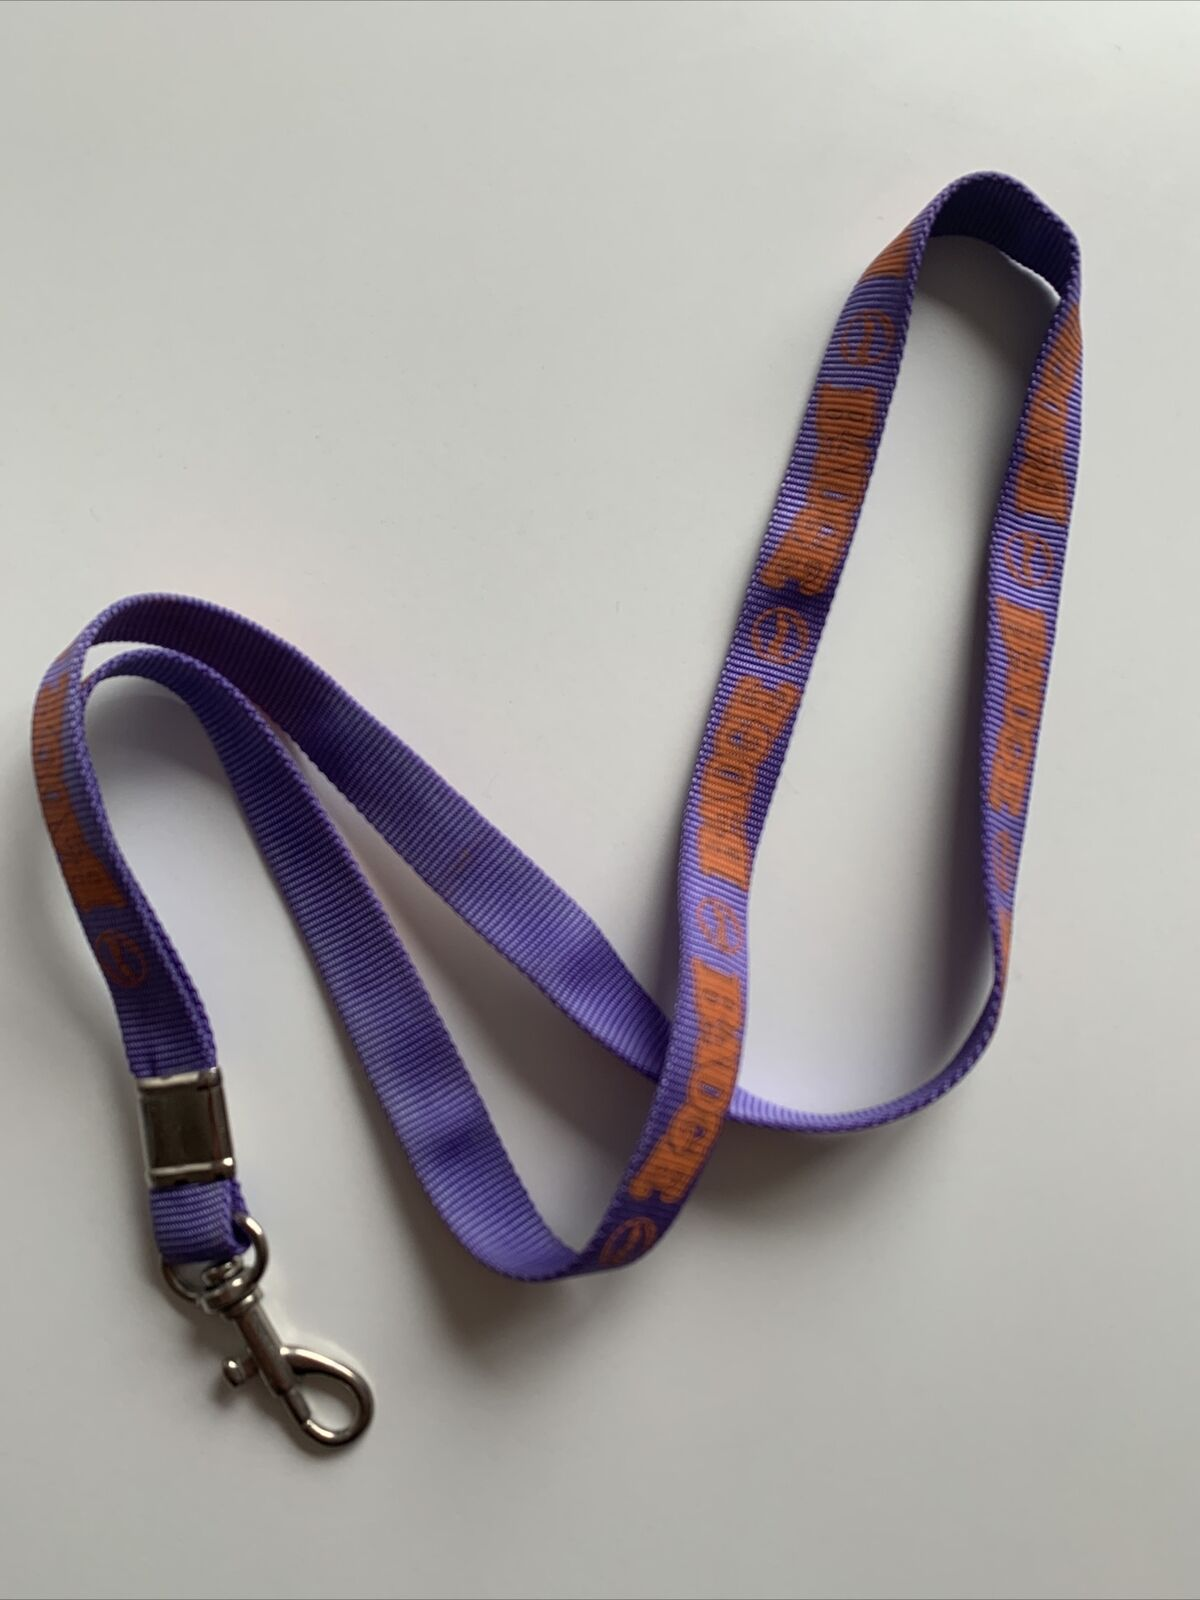 Badge Purple Lanyard Breakaway Safety Neck Strap With Metal Clip ID Badge Keys